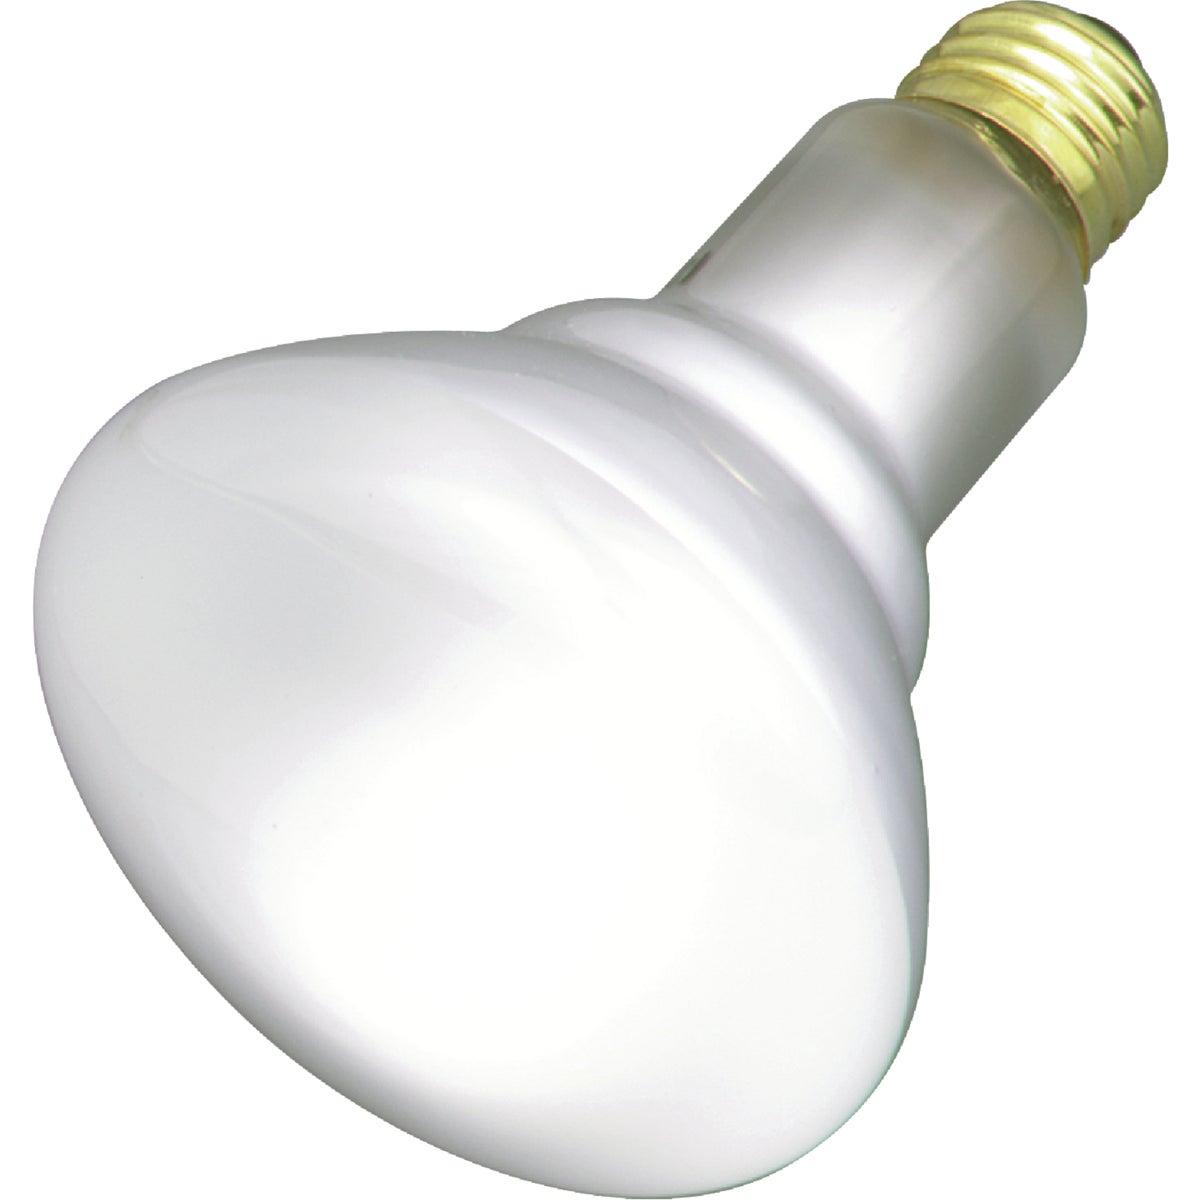 Westinghouse 0368000, 50 Watt, 120 Volt Frosted Incand BR30 Light Bulb, 2000 ...